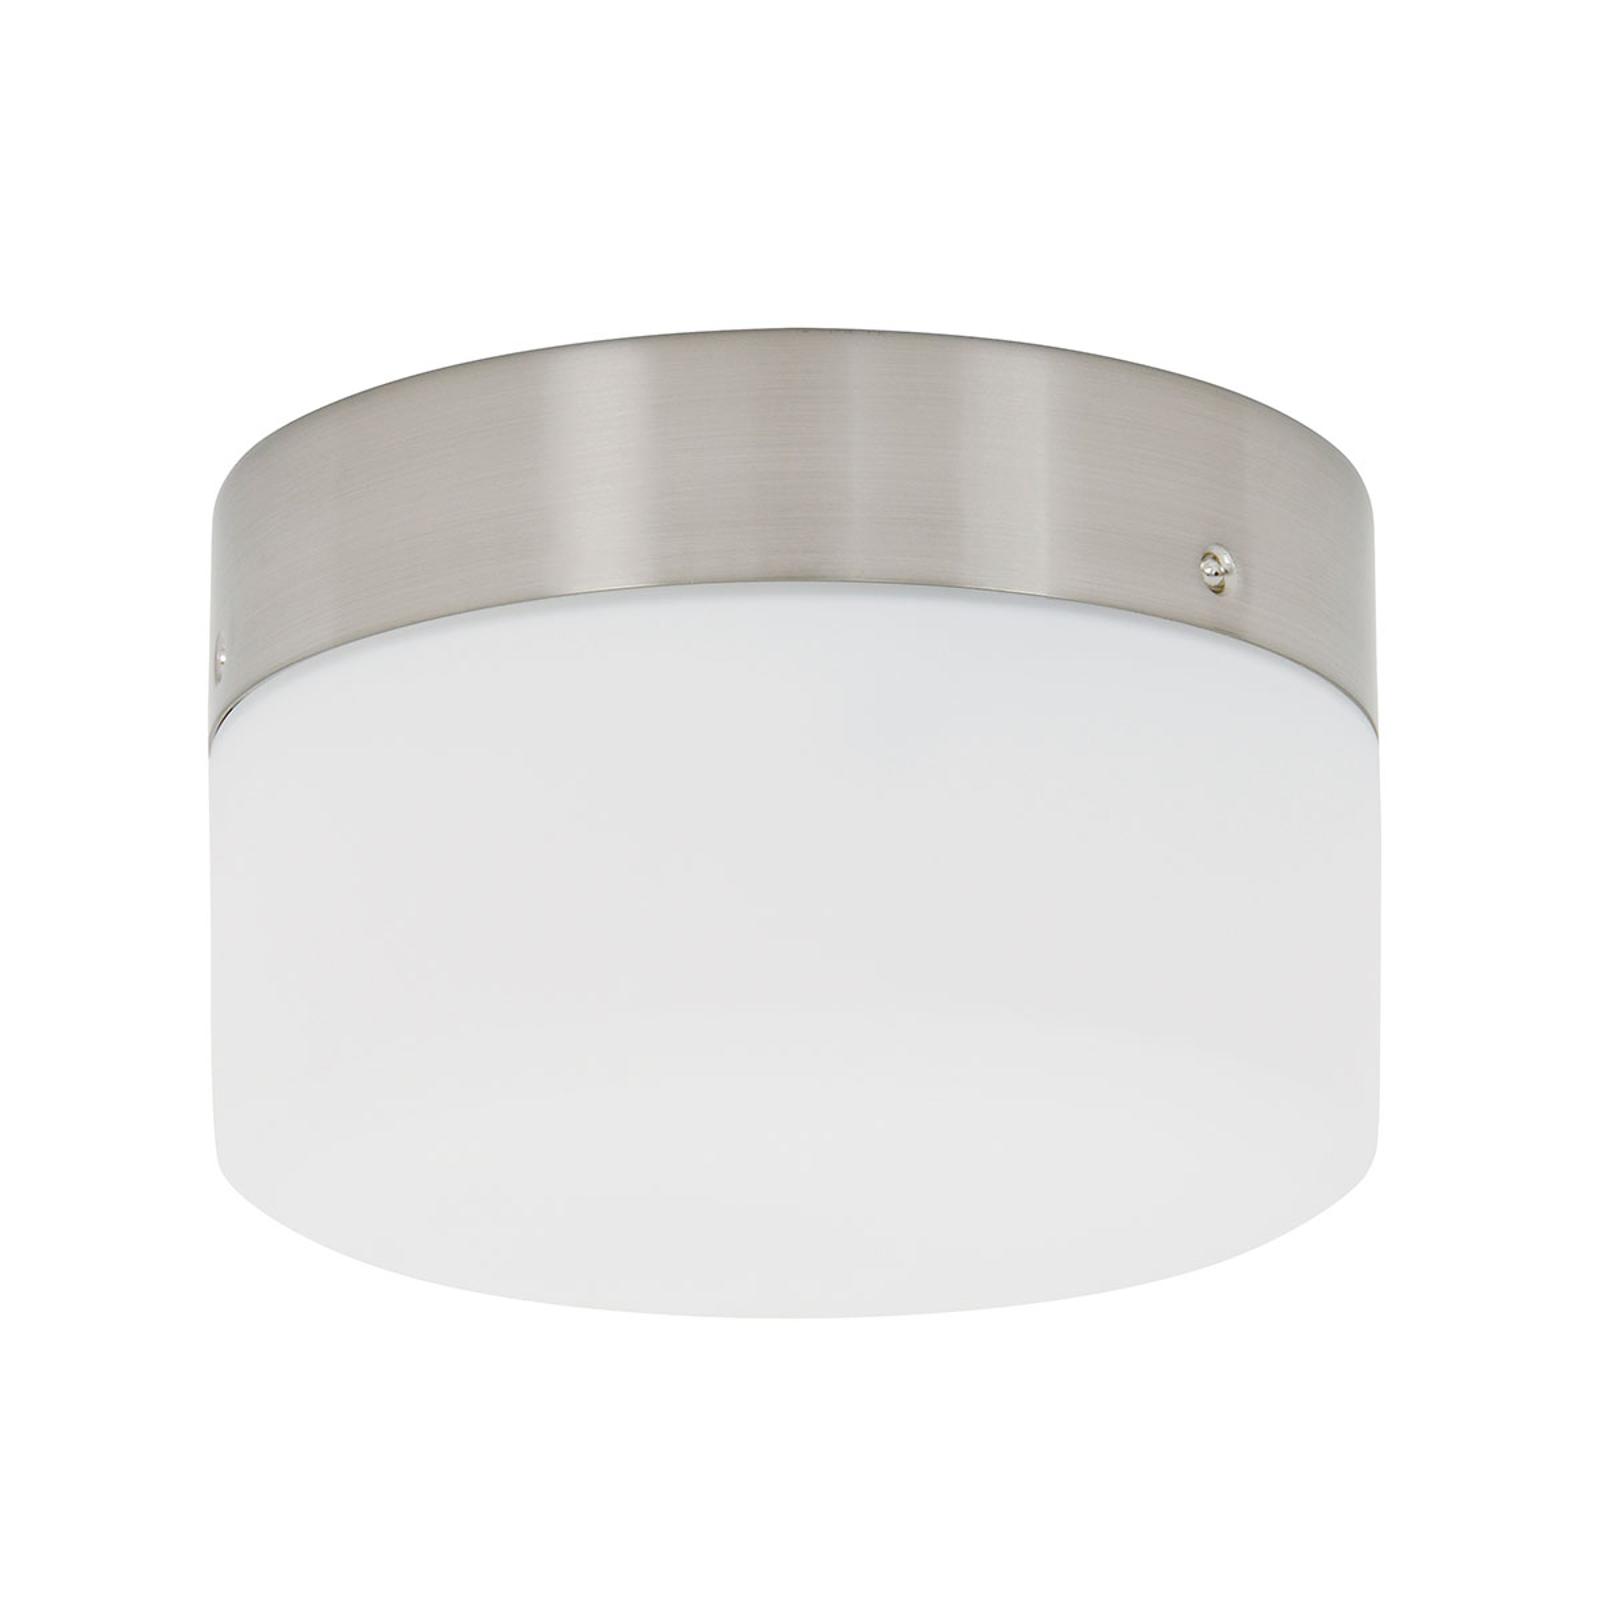 Lyssæt til loftventilator, GX53, krom